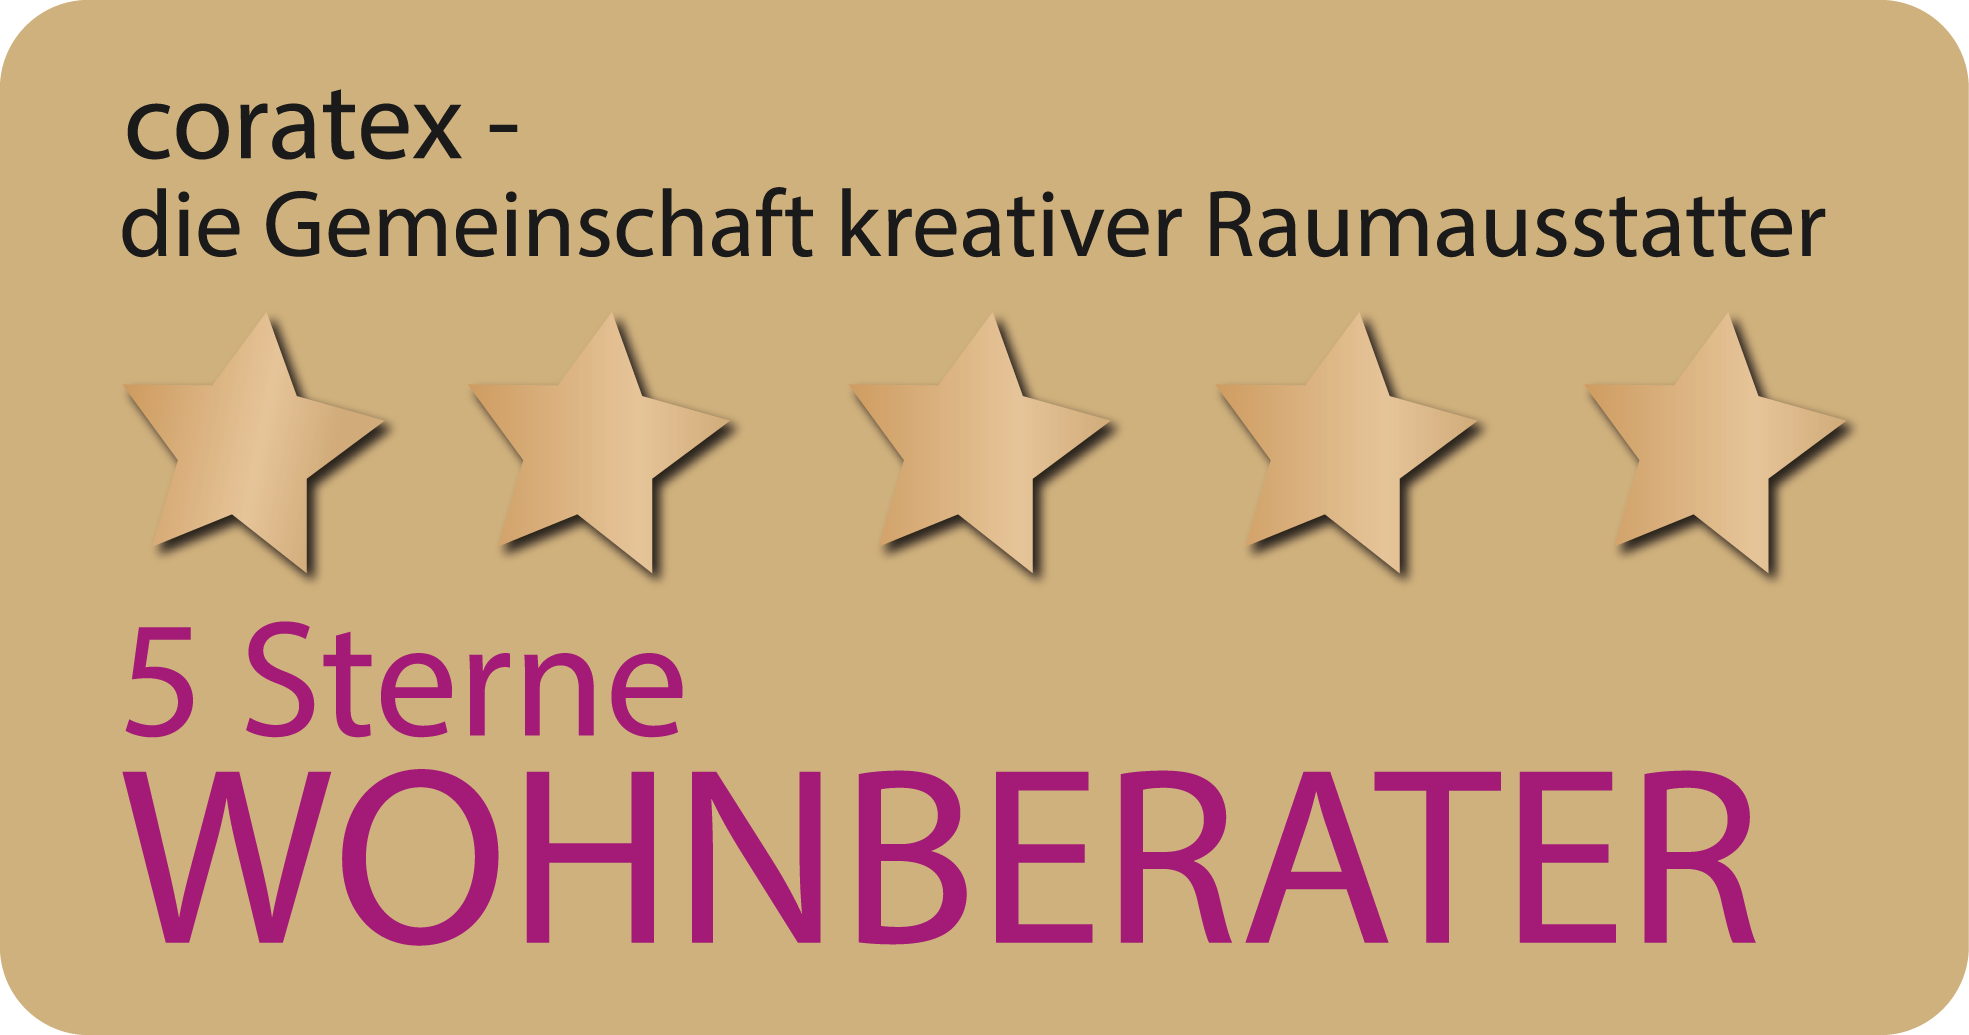 5-Sterne-Wohnberater